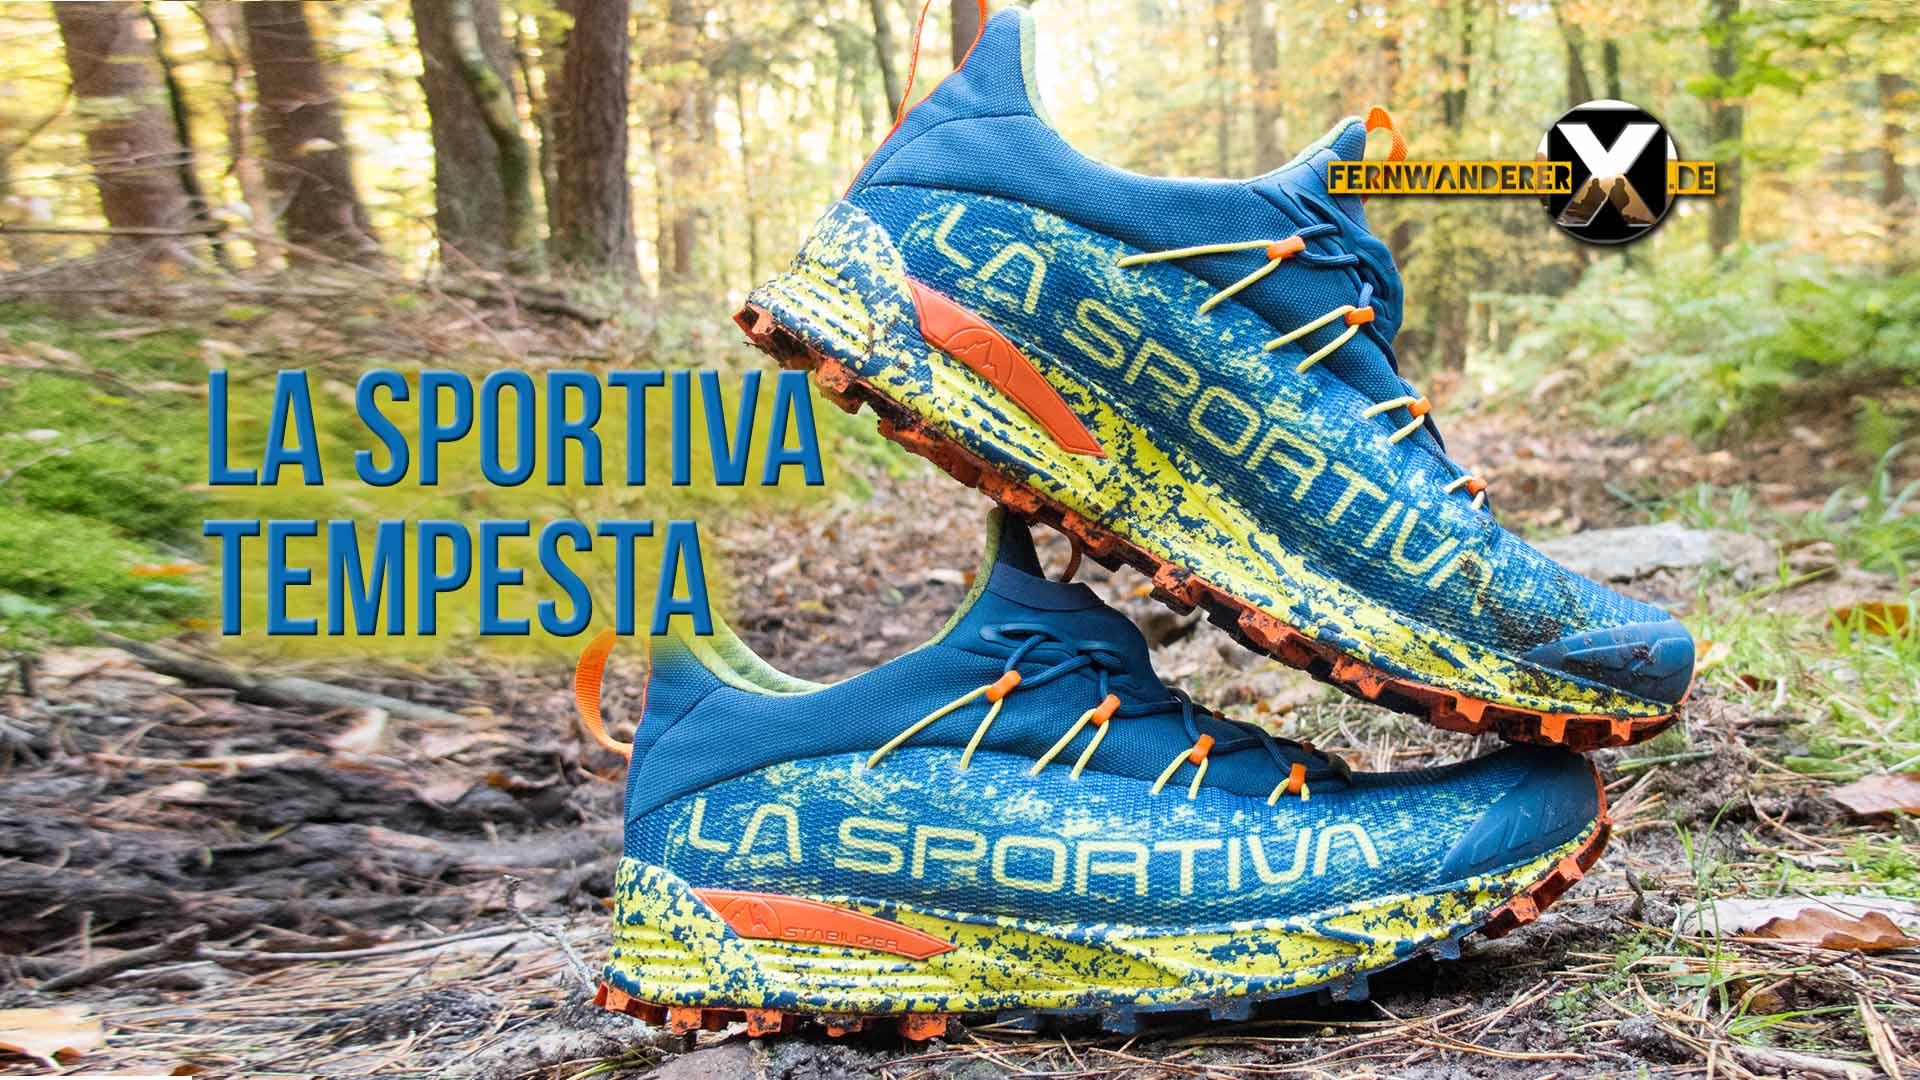 [:de]La Sportiva Tempesta- Mountain Running Schuh Review[:en]La Sportiva Tempesta GTX Review[:]